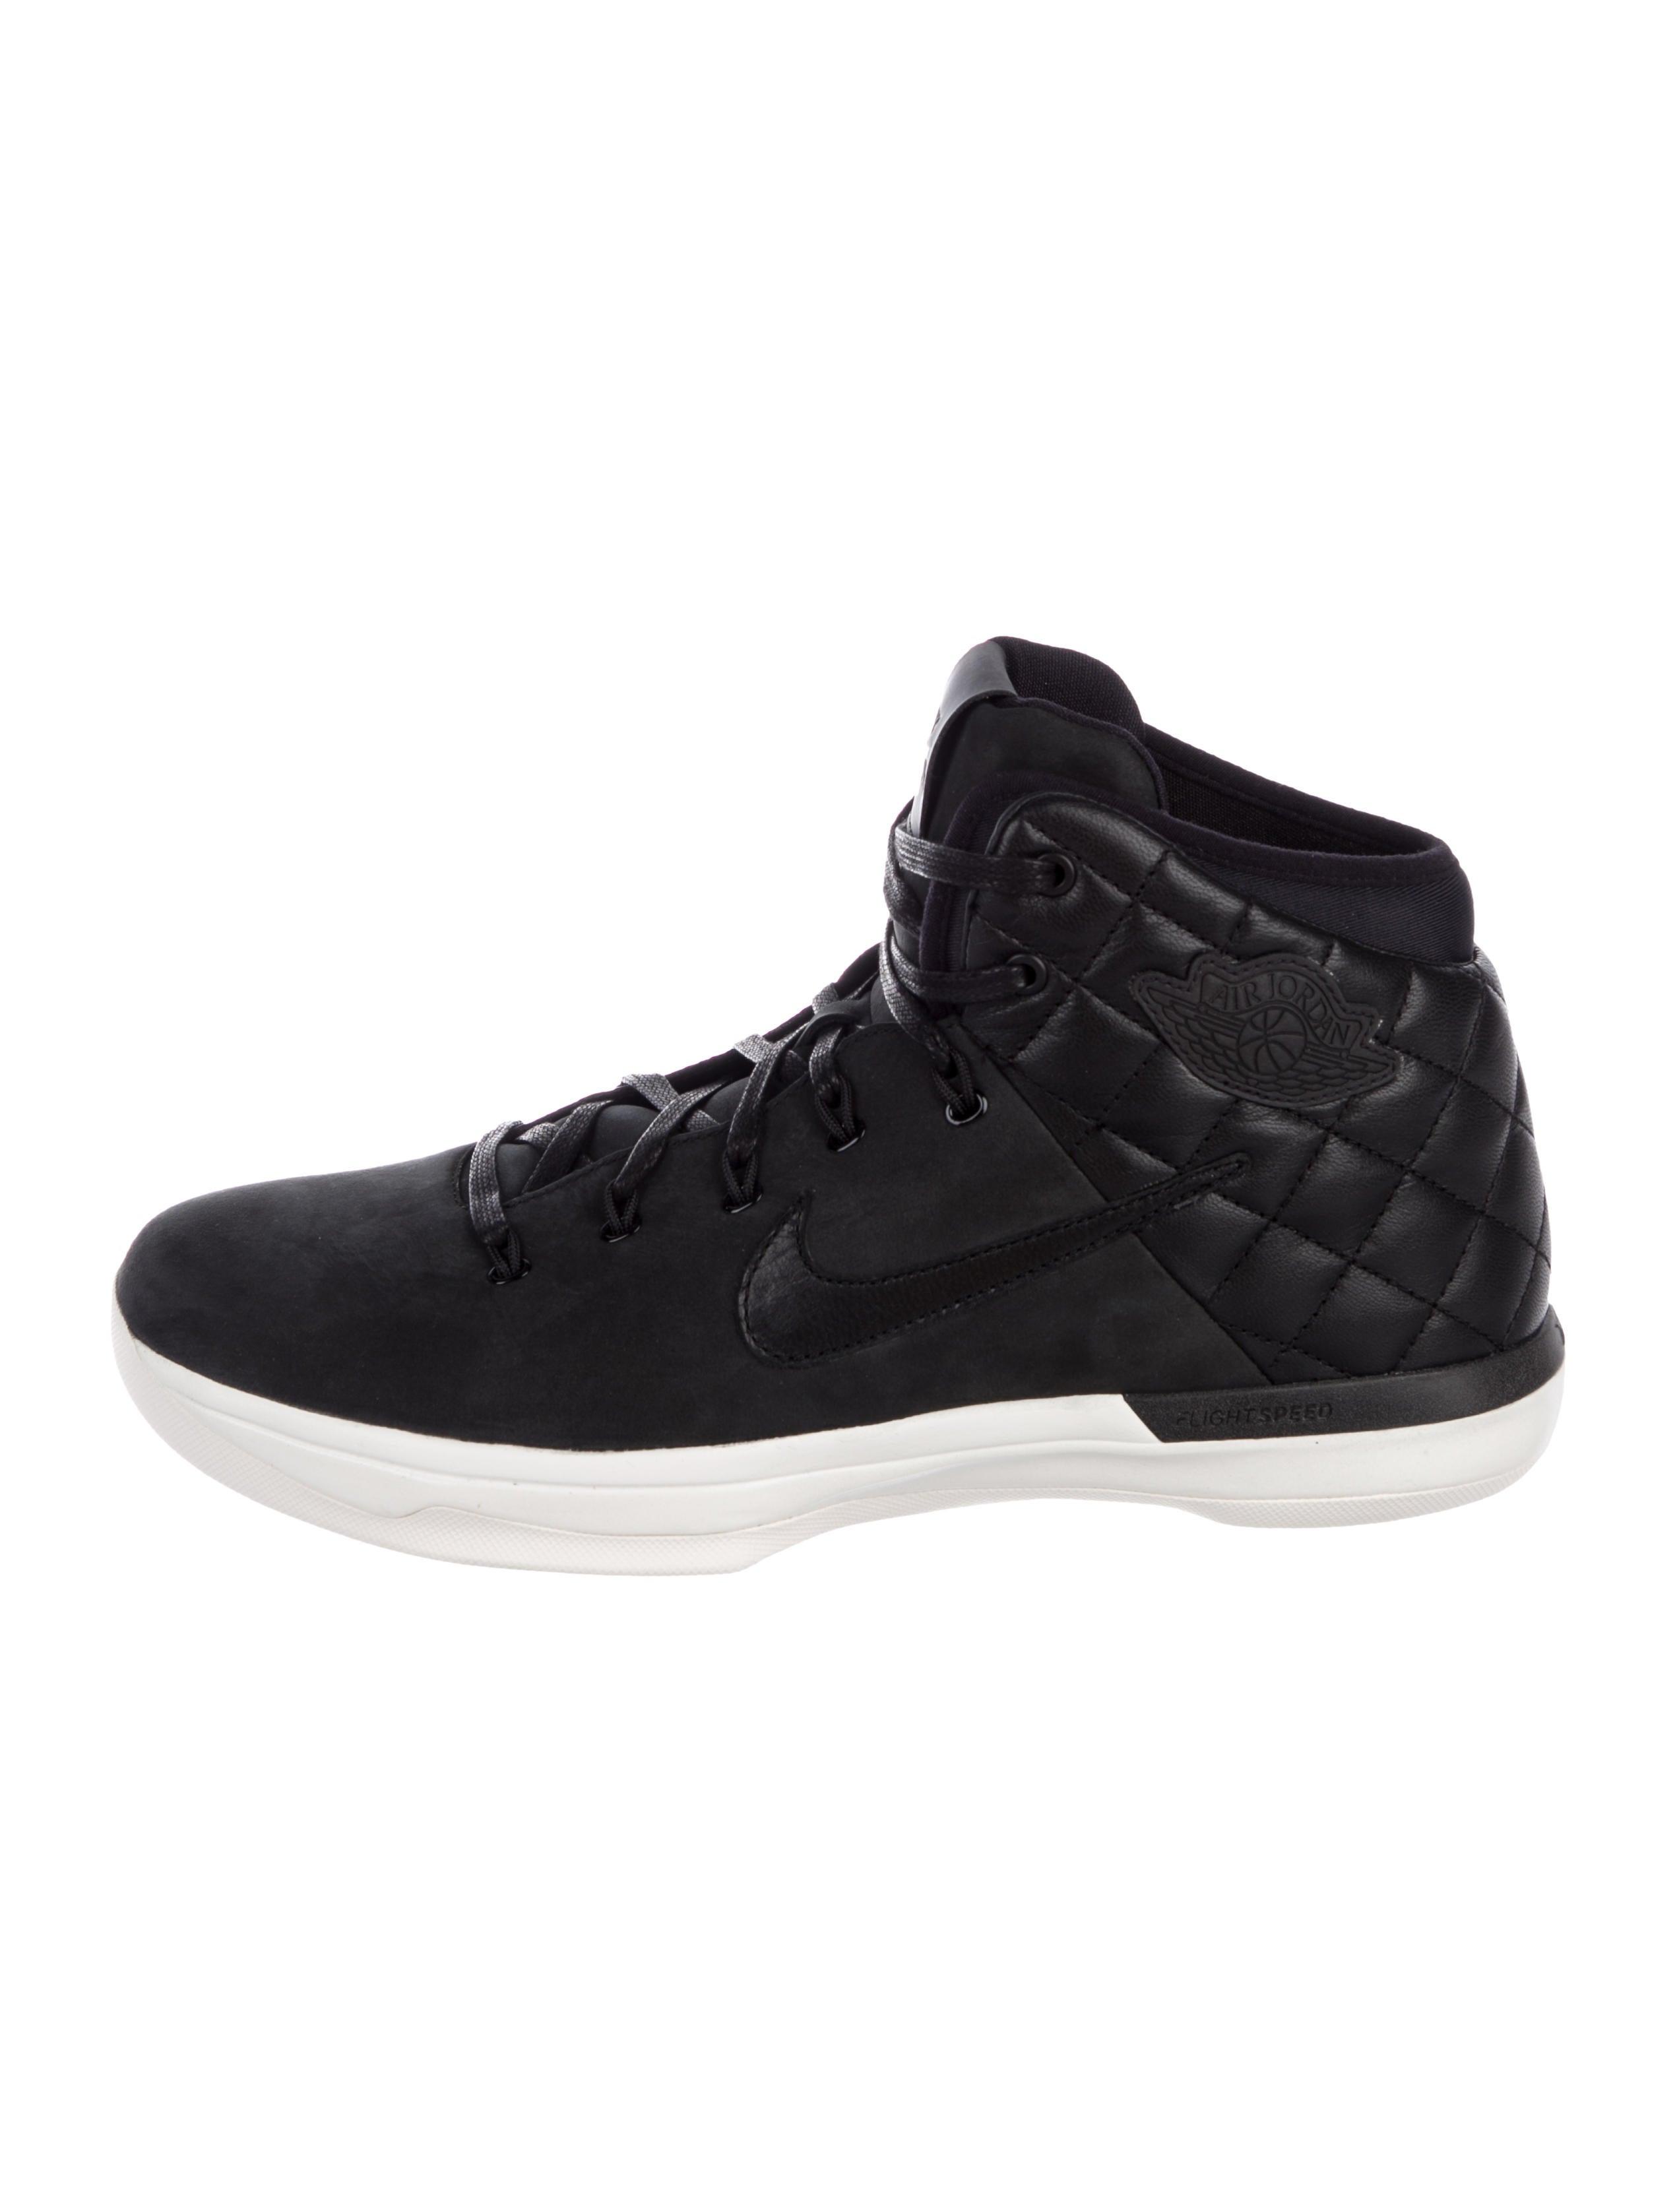 f9c5c568dfa5 Nike Air Jordan 2016 XXXI Cyber Monday Black Cat Sample Sneakers w ...